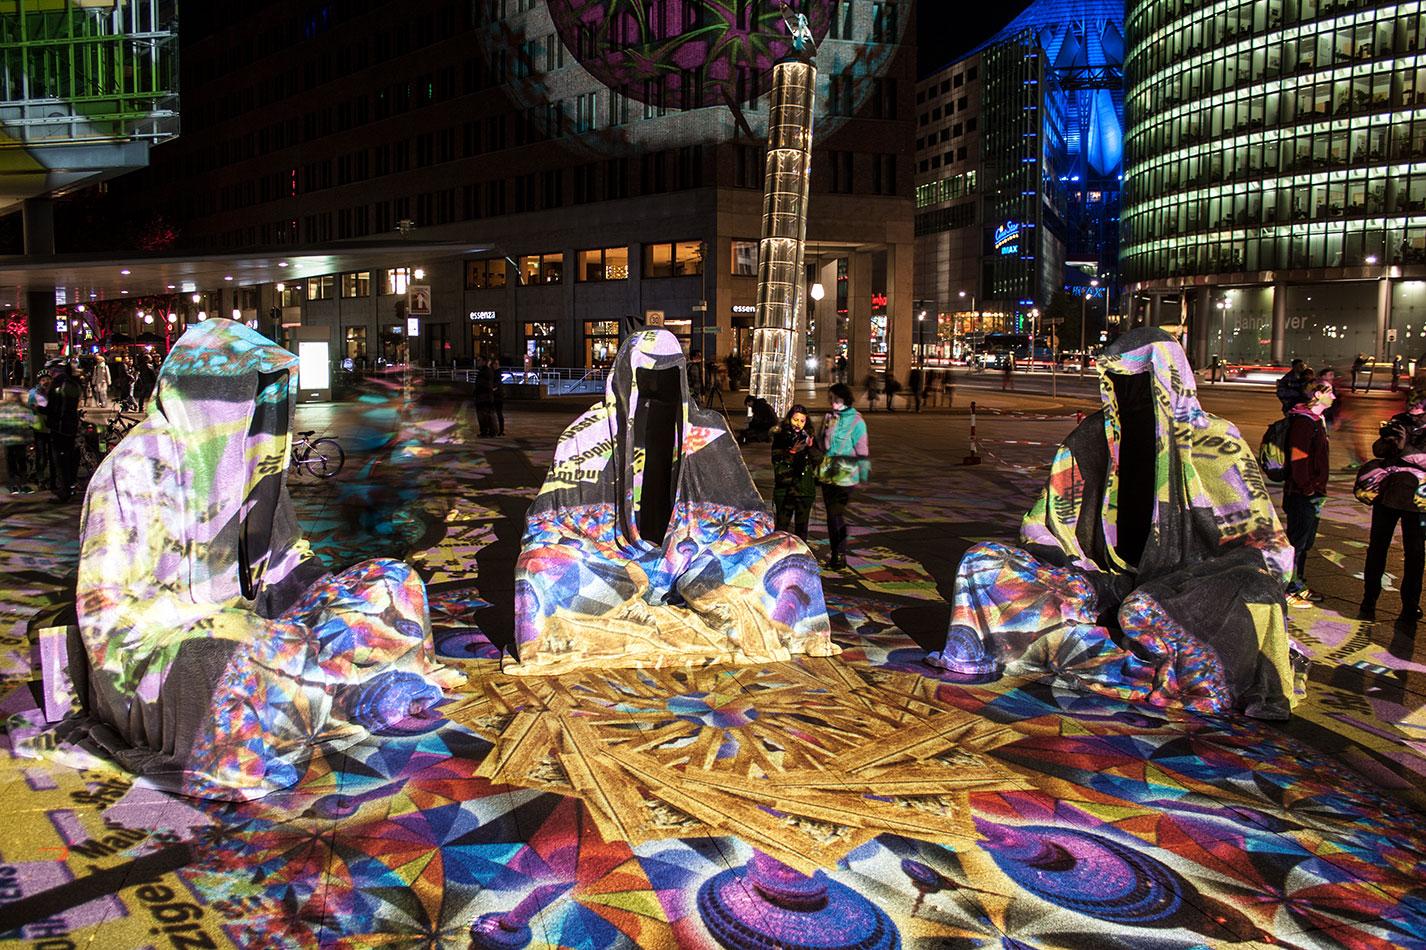 festival-of-lights-berlin-potzdamer-platz-light-art-show-exhibition-lumina-guardians-of-time-manfred-kili-kielnhofer-contemporary-arts-design-large-scale-monumental-public-sculpture-3665